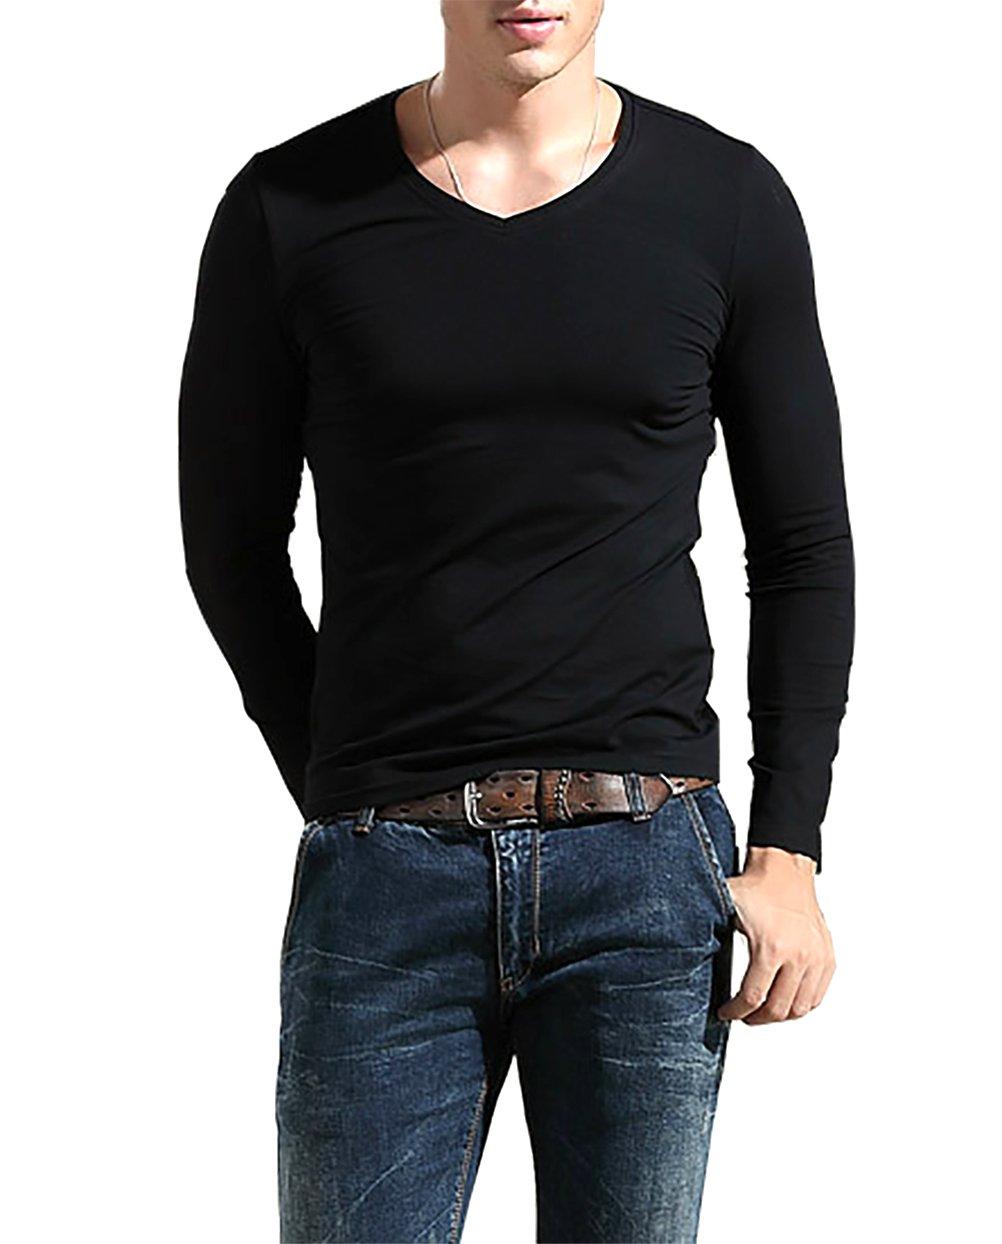 Amoretu Mens V-Neck Long Sleeve Cotton T-Shirt Casual Tops Black Medium